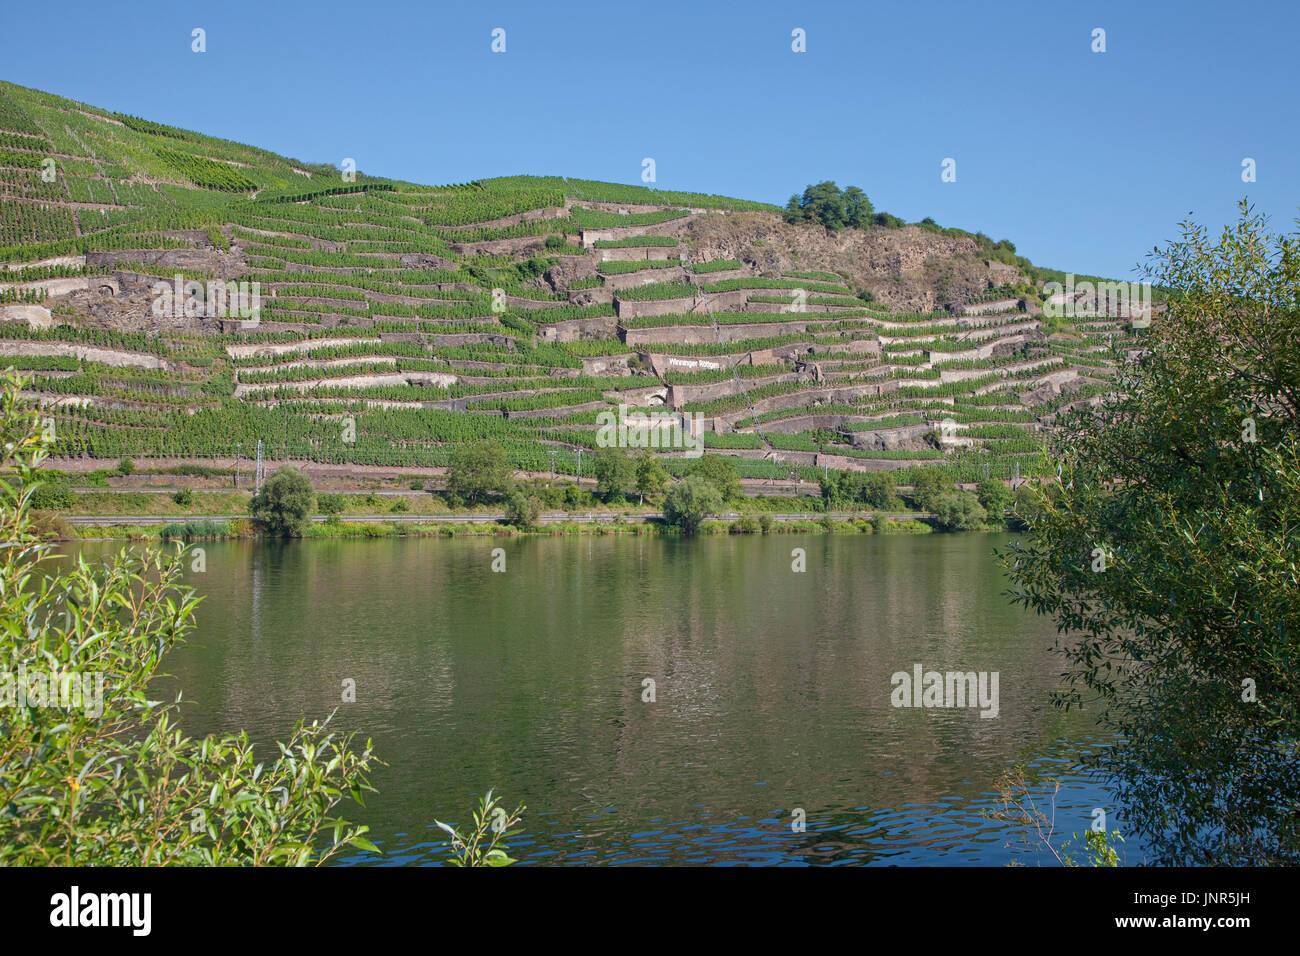 Terrassenmosel, Untermosel, Landkreis Mayen-Koblenz, Rheinland-Pfalz, Deutschland, Europa   wine terrace, Mosel river, Germany - Stock Image